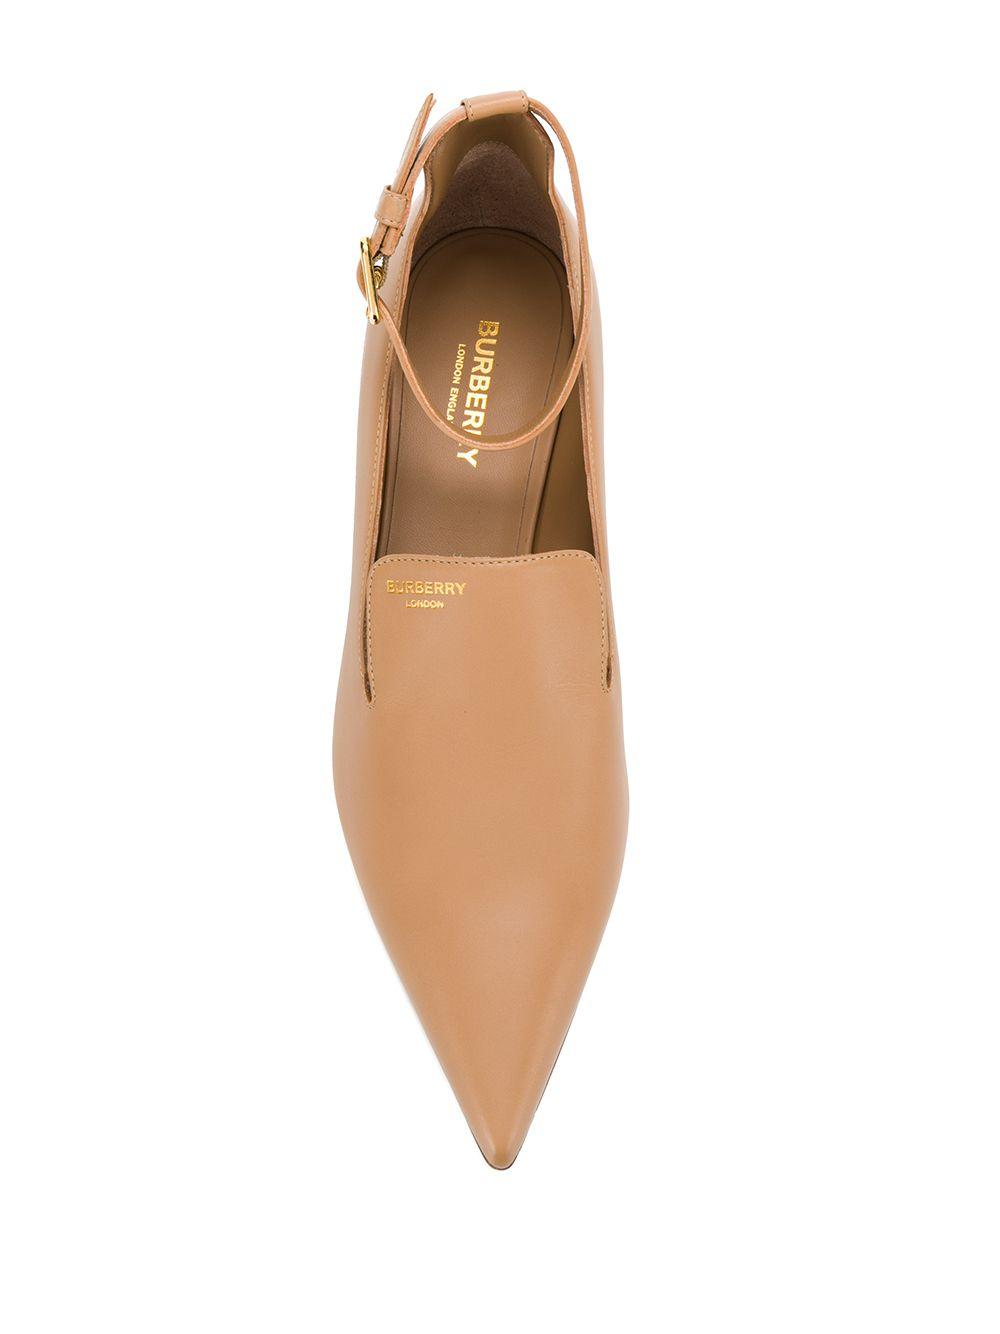 BURBERRY | pointed toe kitten heel pumps | Clouty